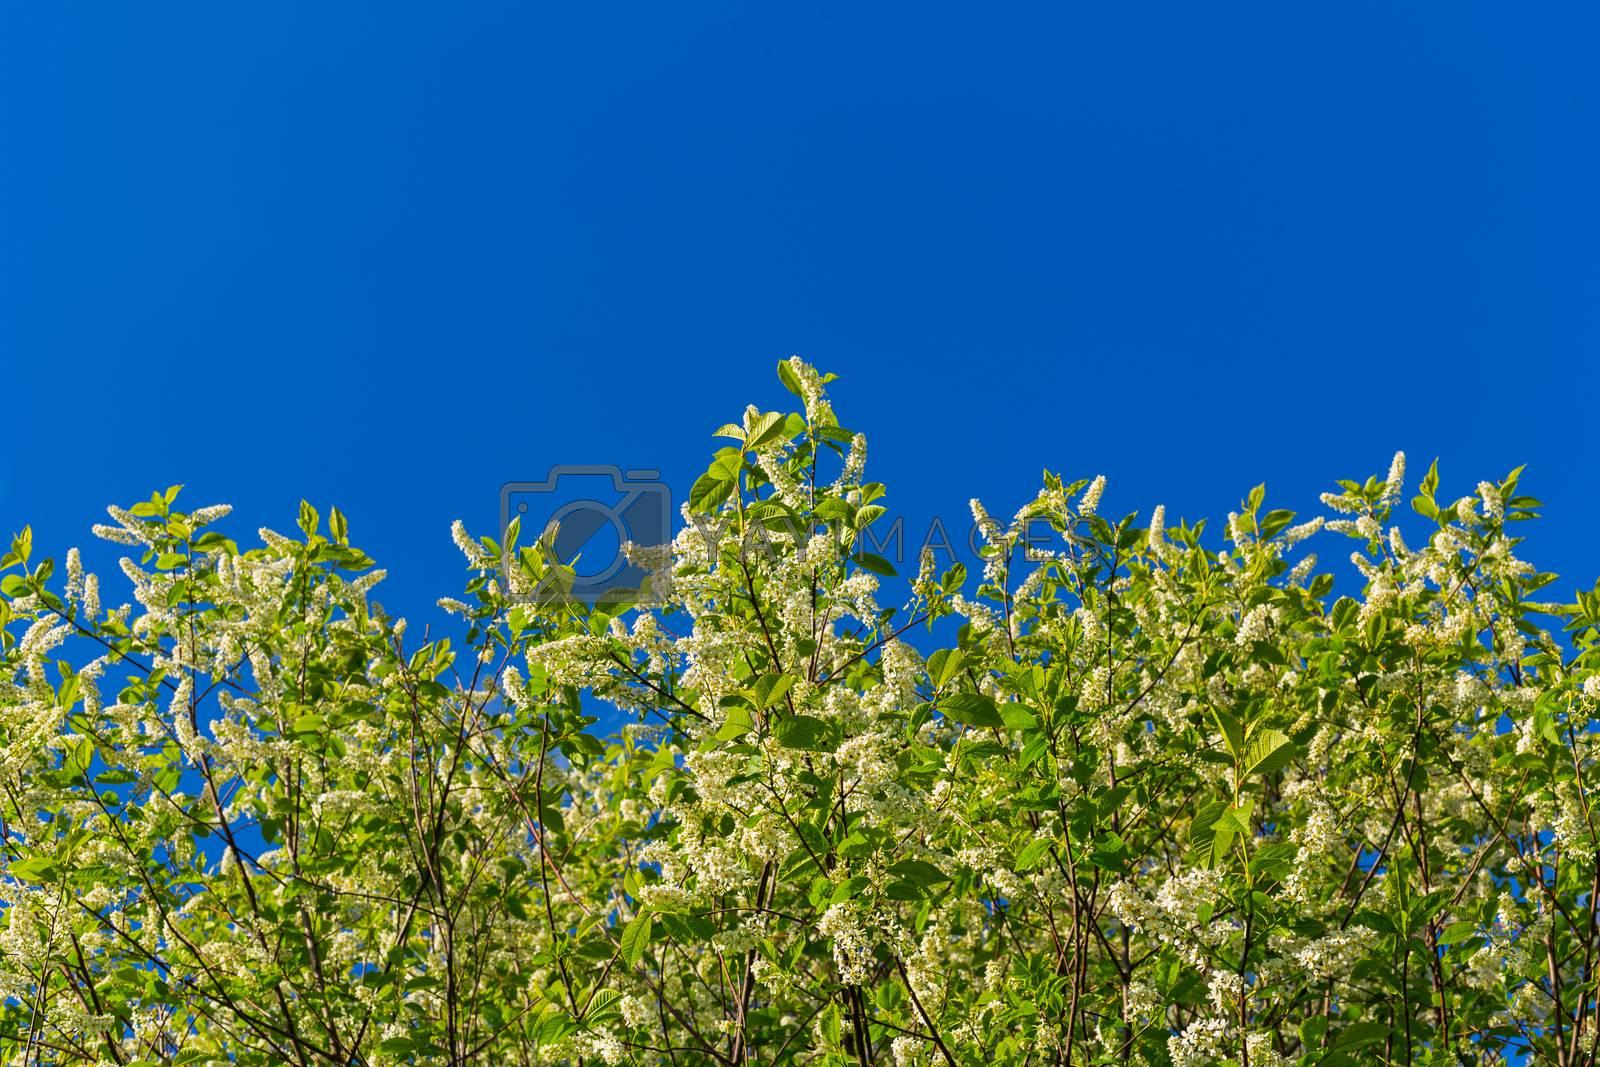 florescence of bird-cherry on clear blue sky